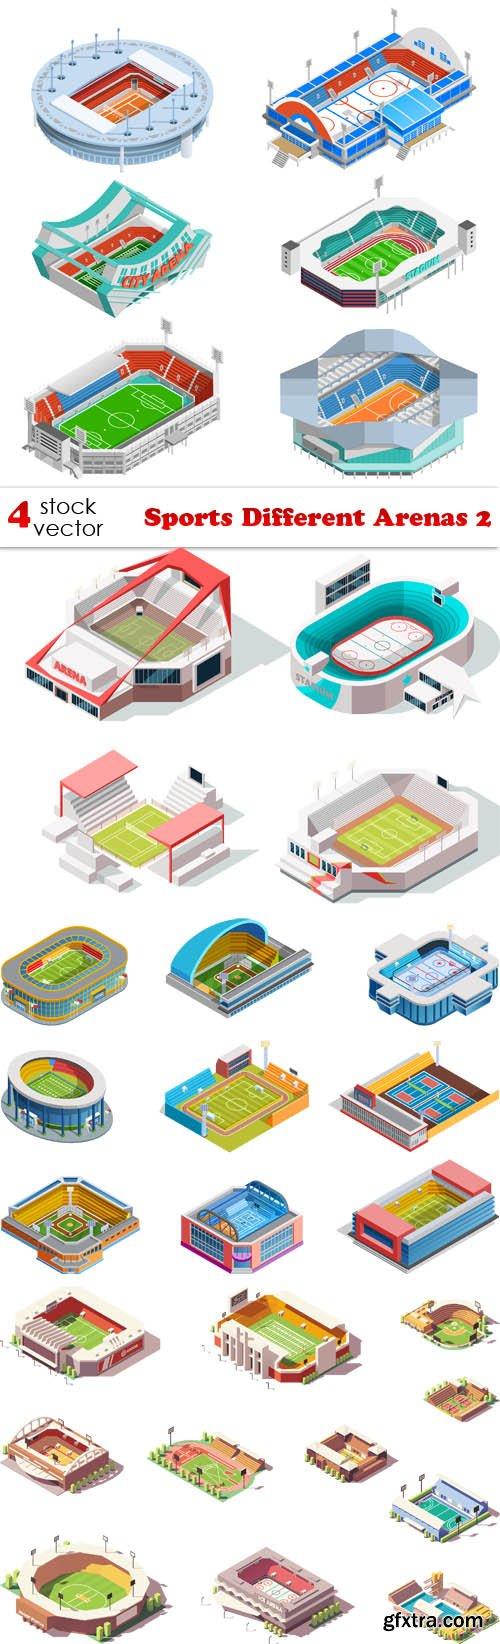 Vectors - Sports Different Arenas 2